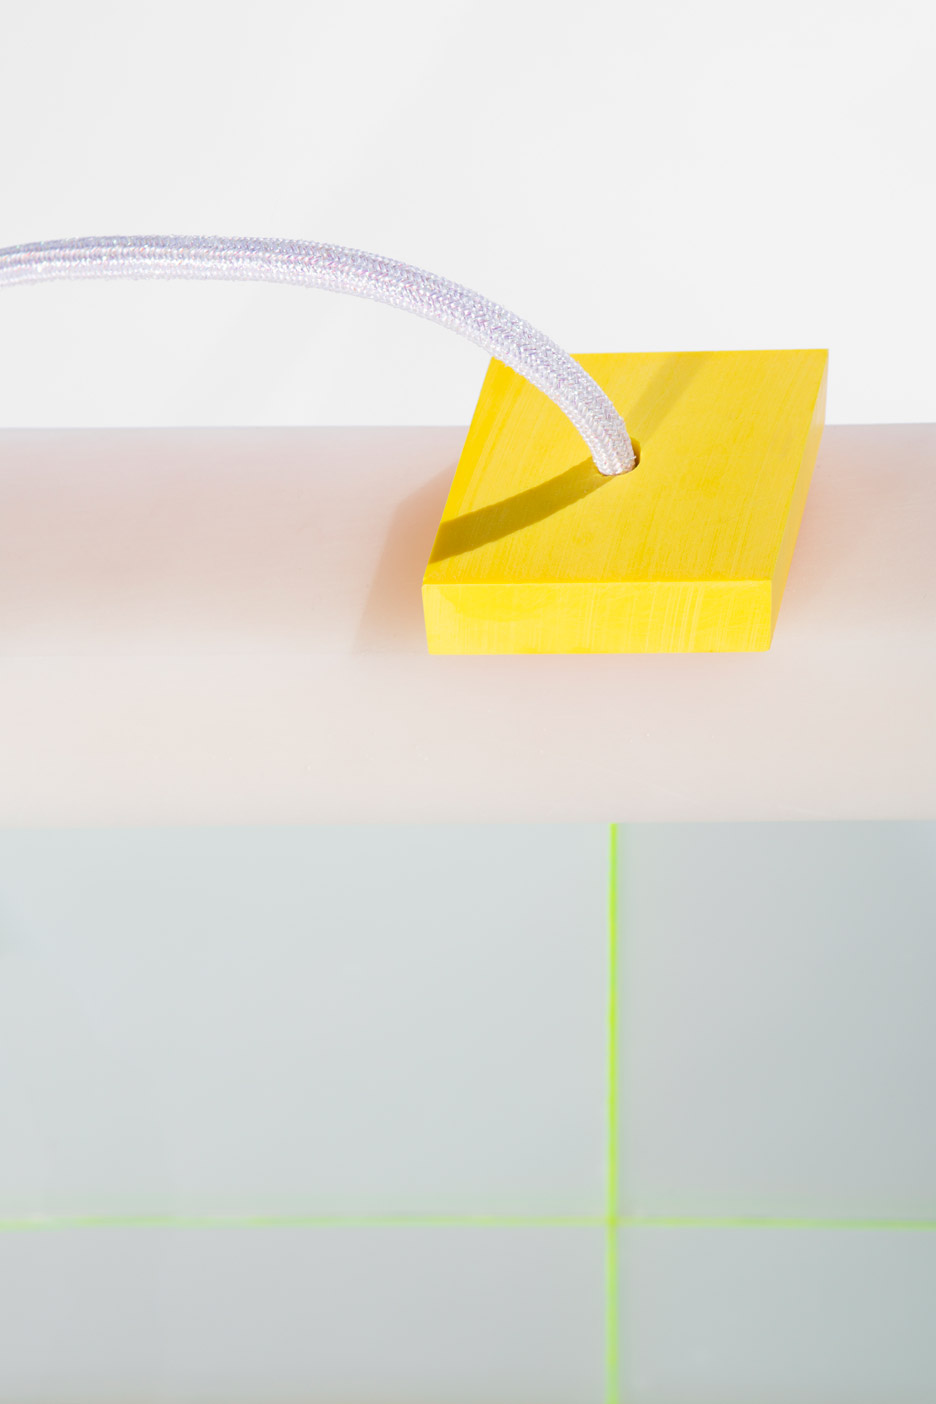 Absurd electronics by Dan Adlešič